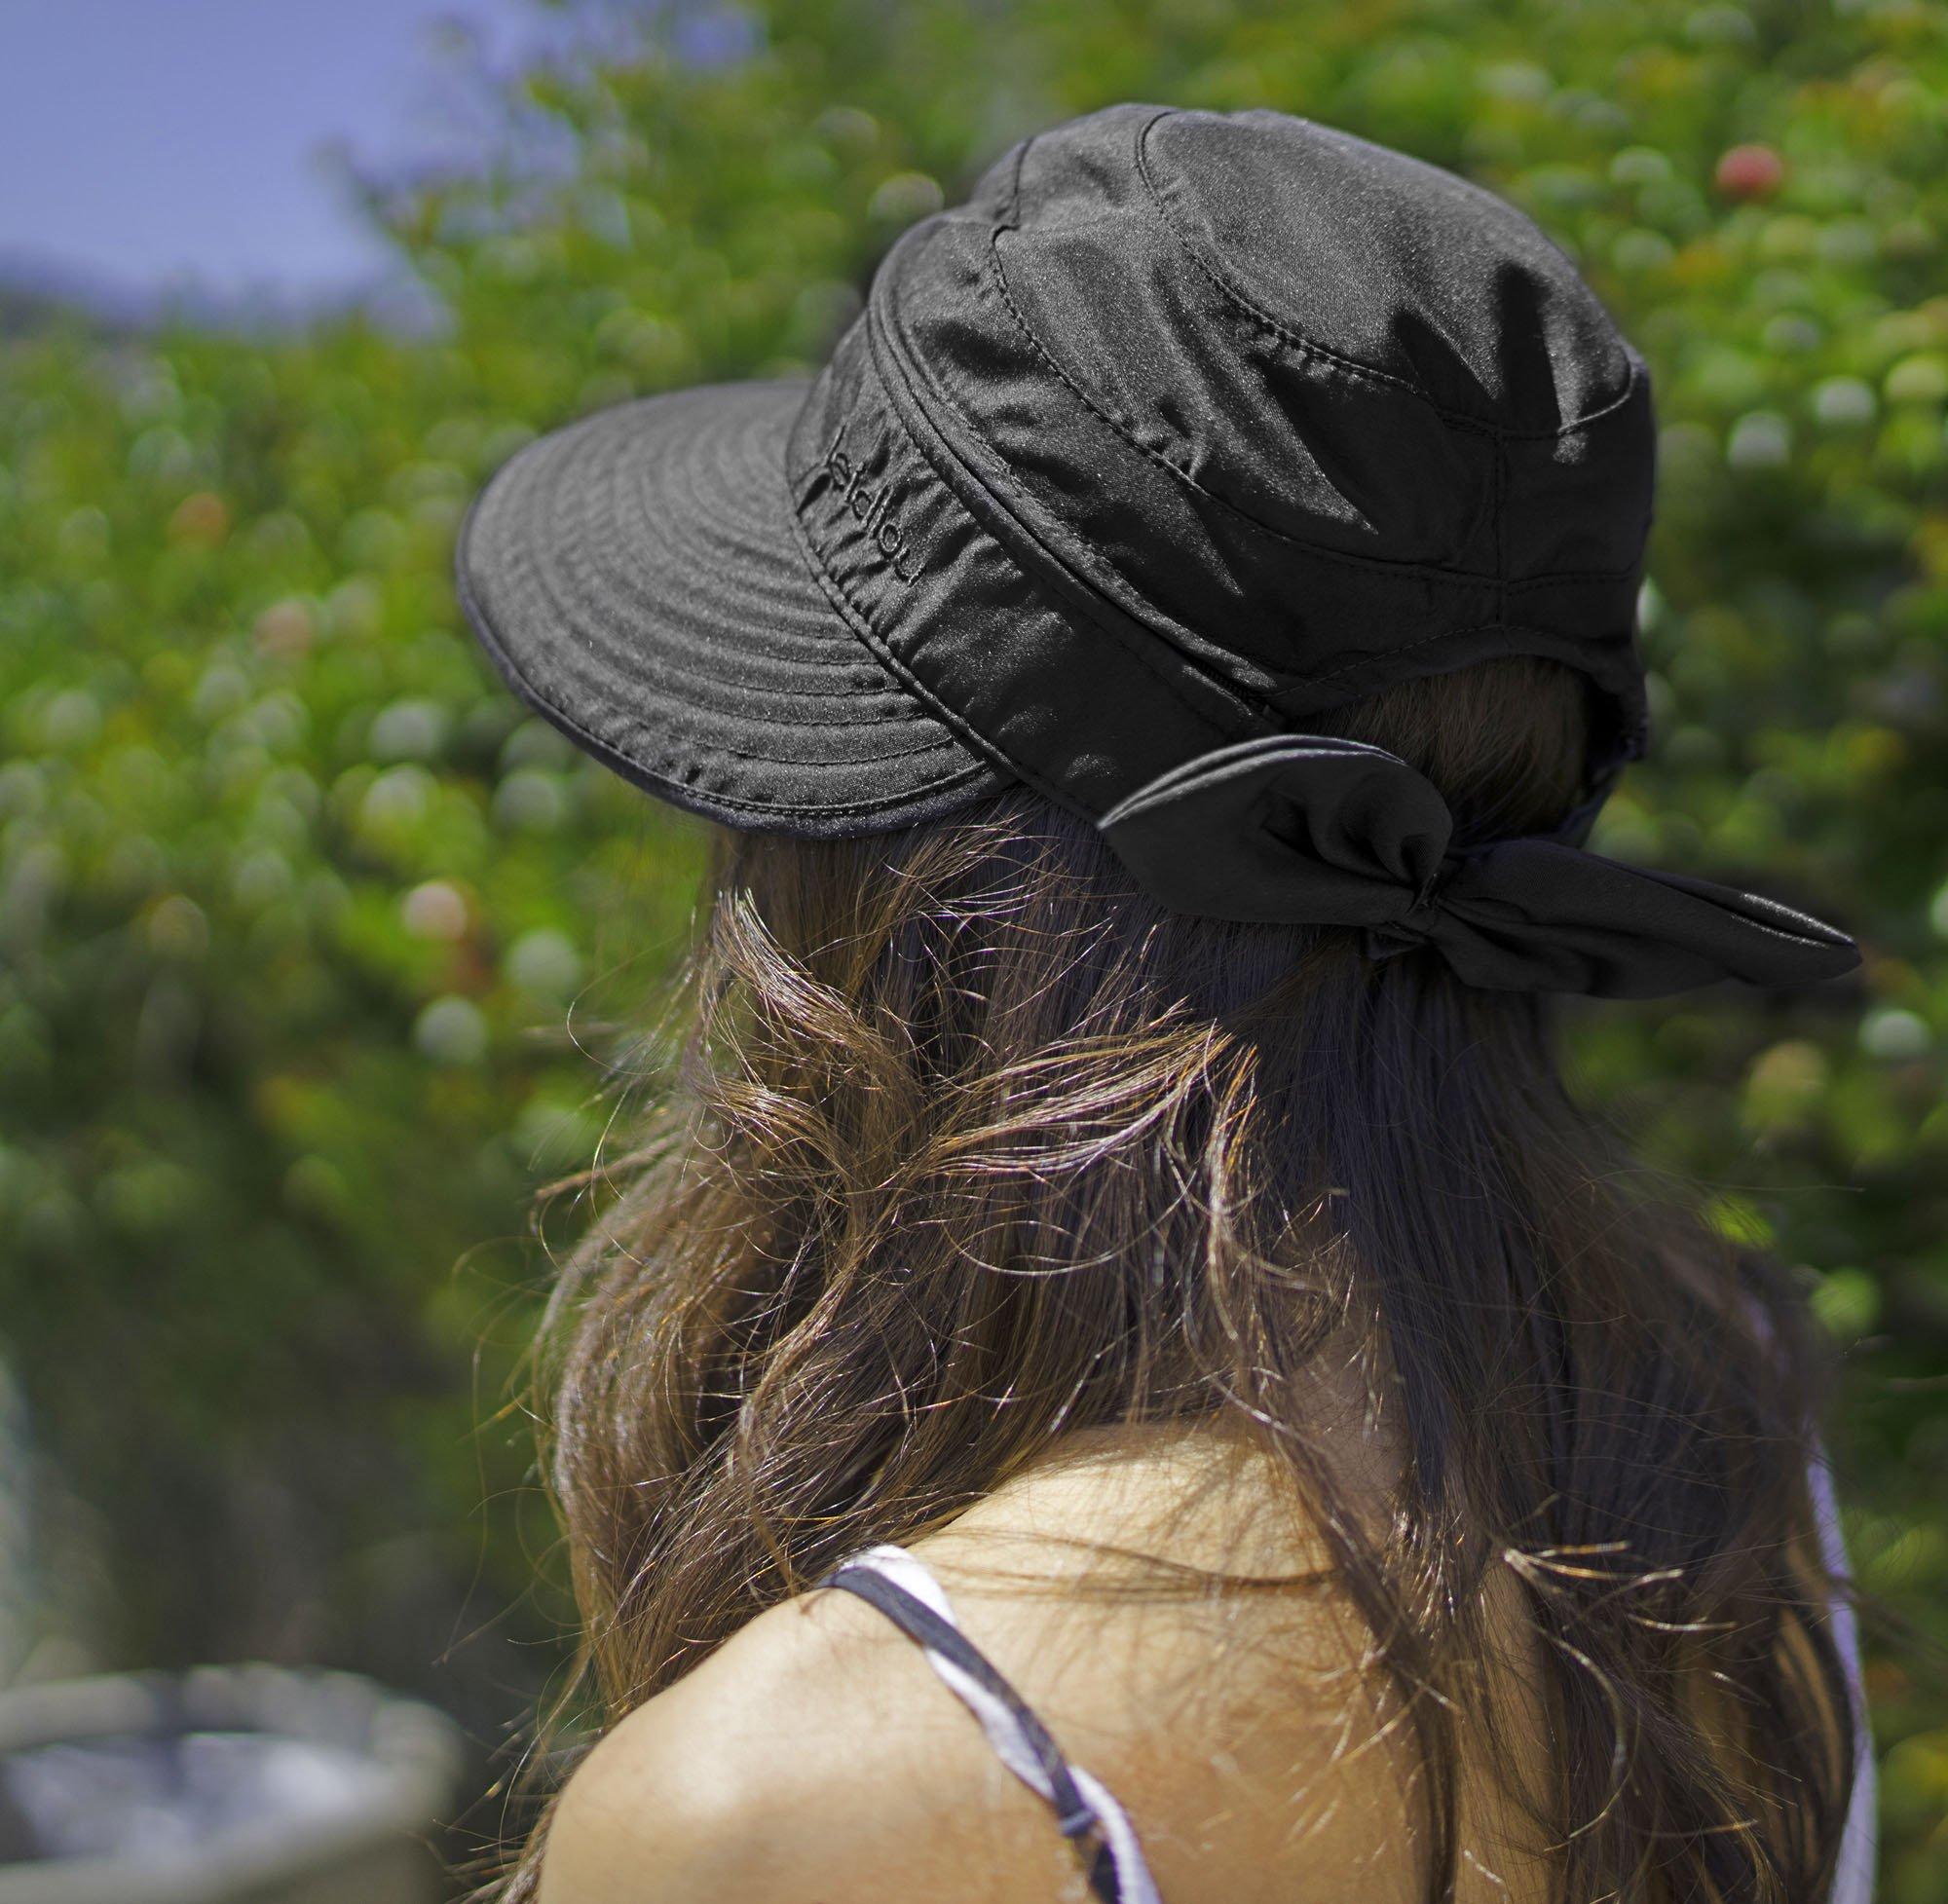 c15ad708d Details about Simplicity Women's UPF 50+ UV Sun Protective Convertible  Beach Hat Visor Black